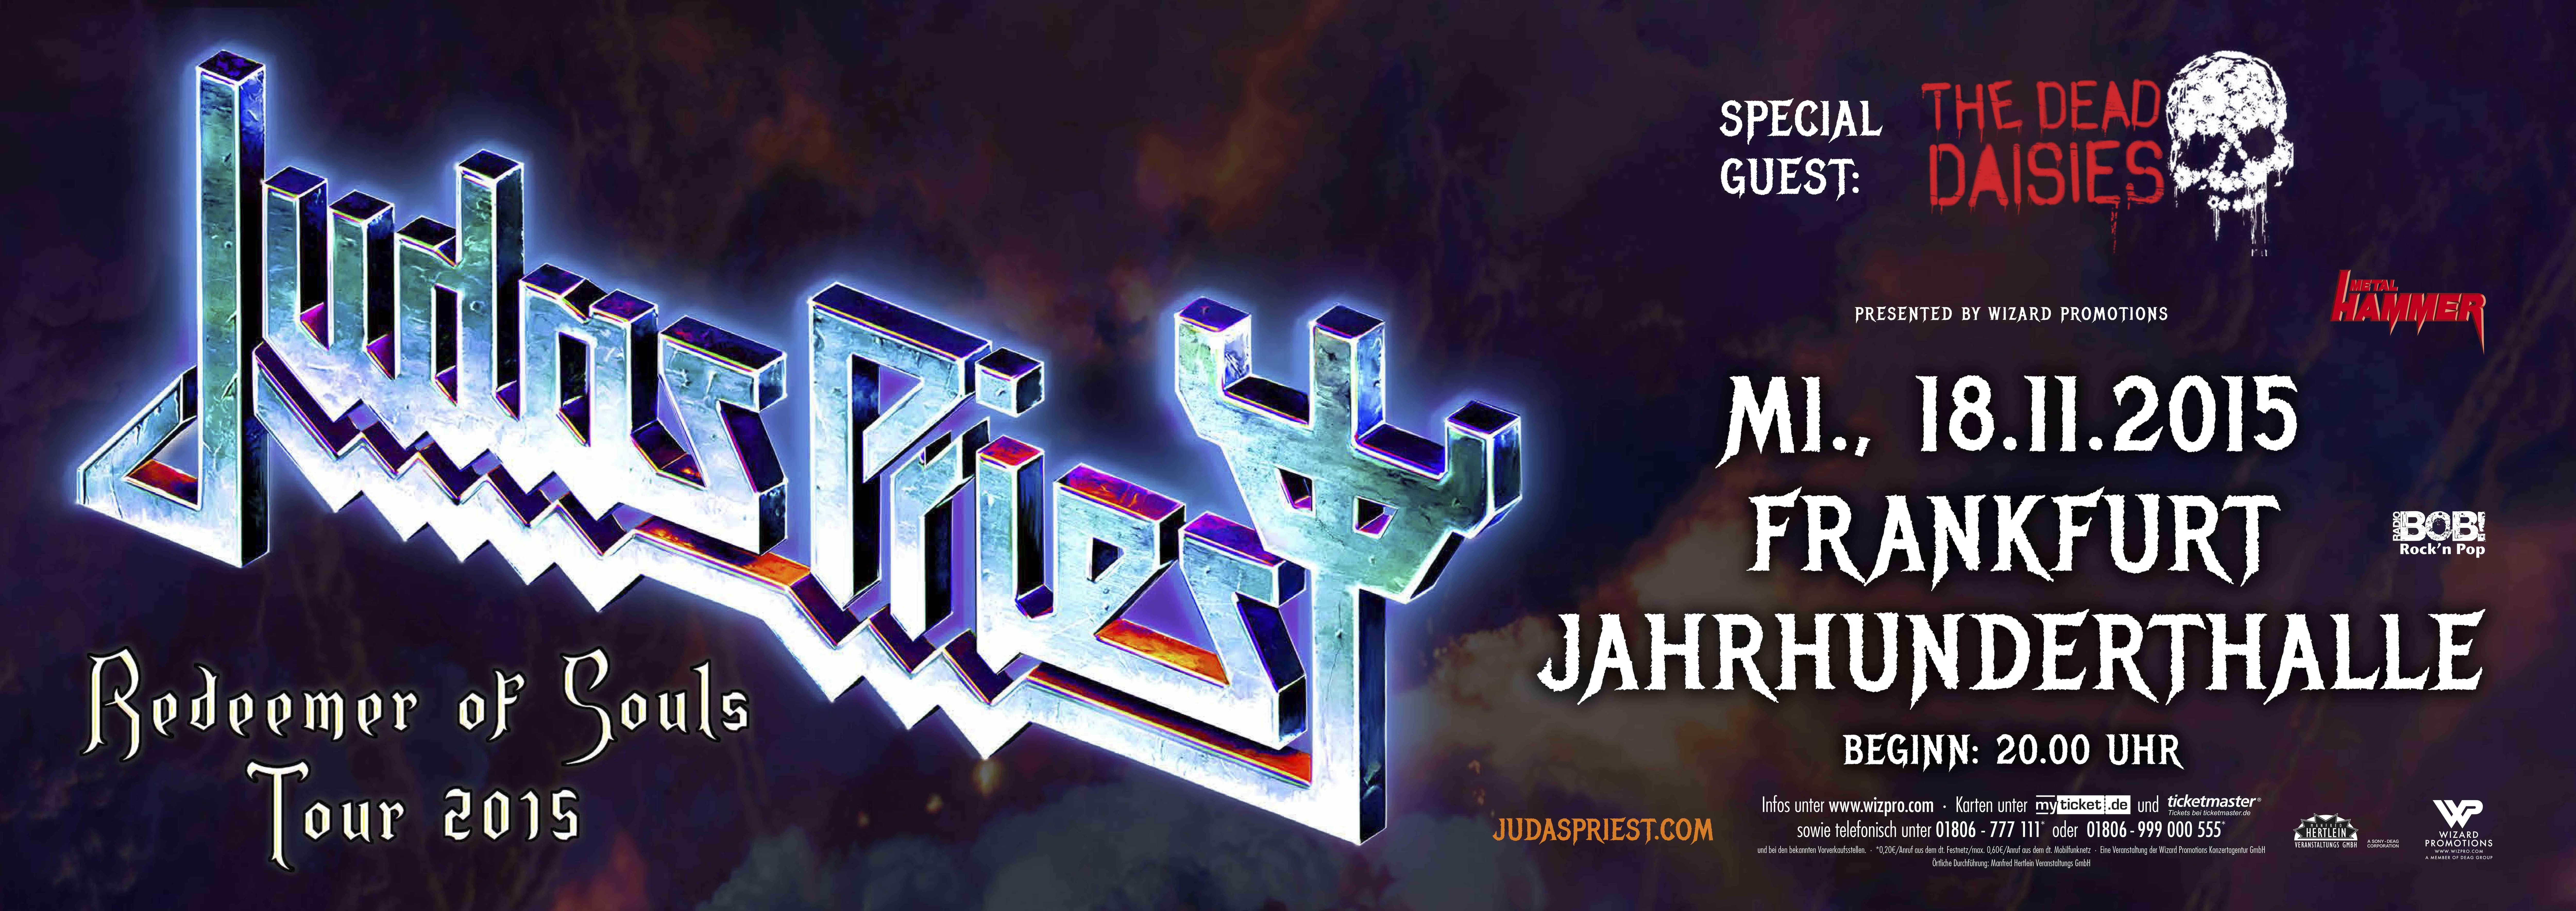 JudasPriest_2xA0q_001